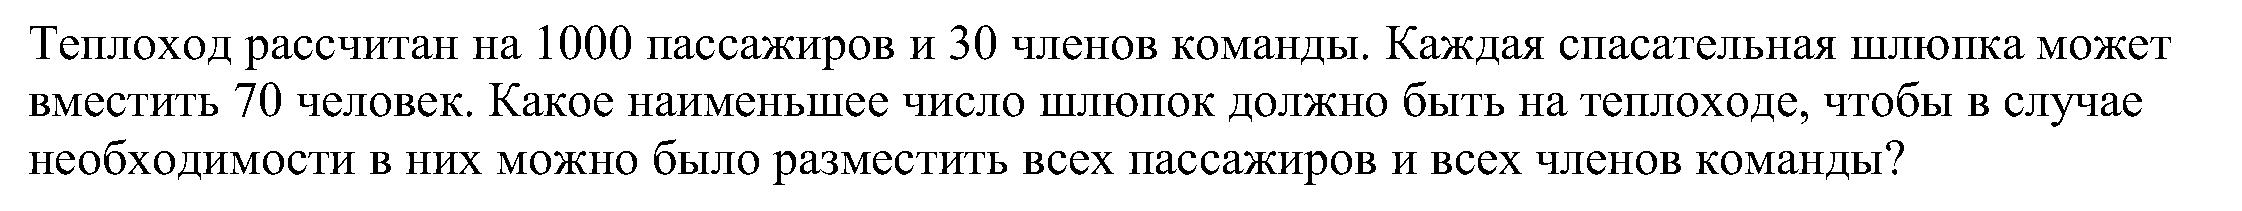 hello_html_52028b0.png